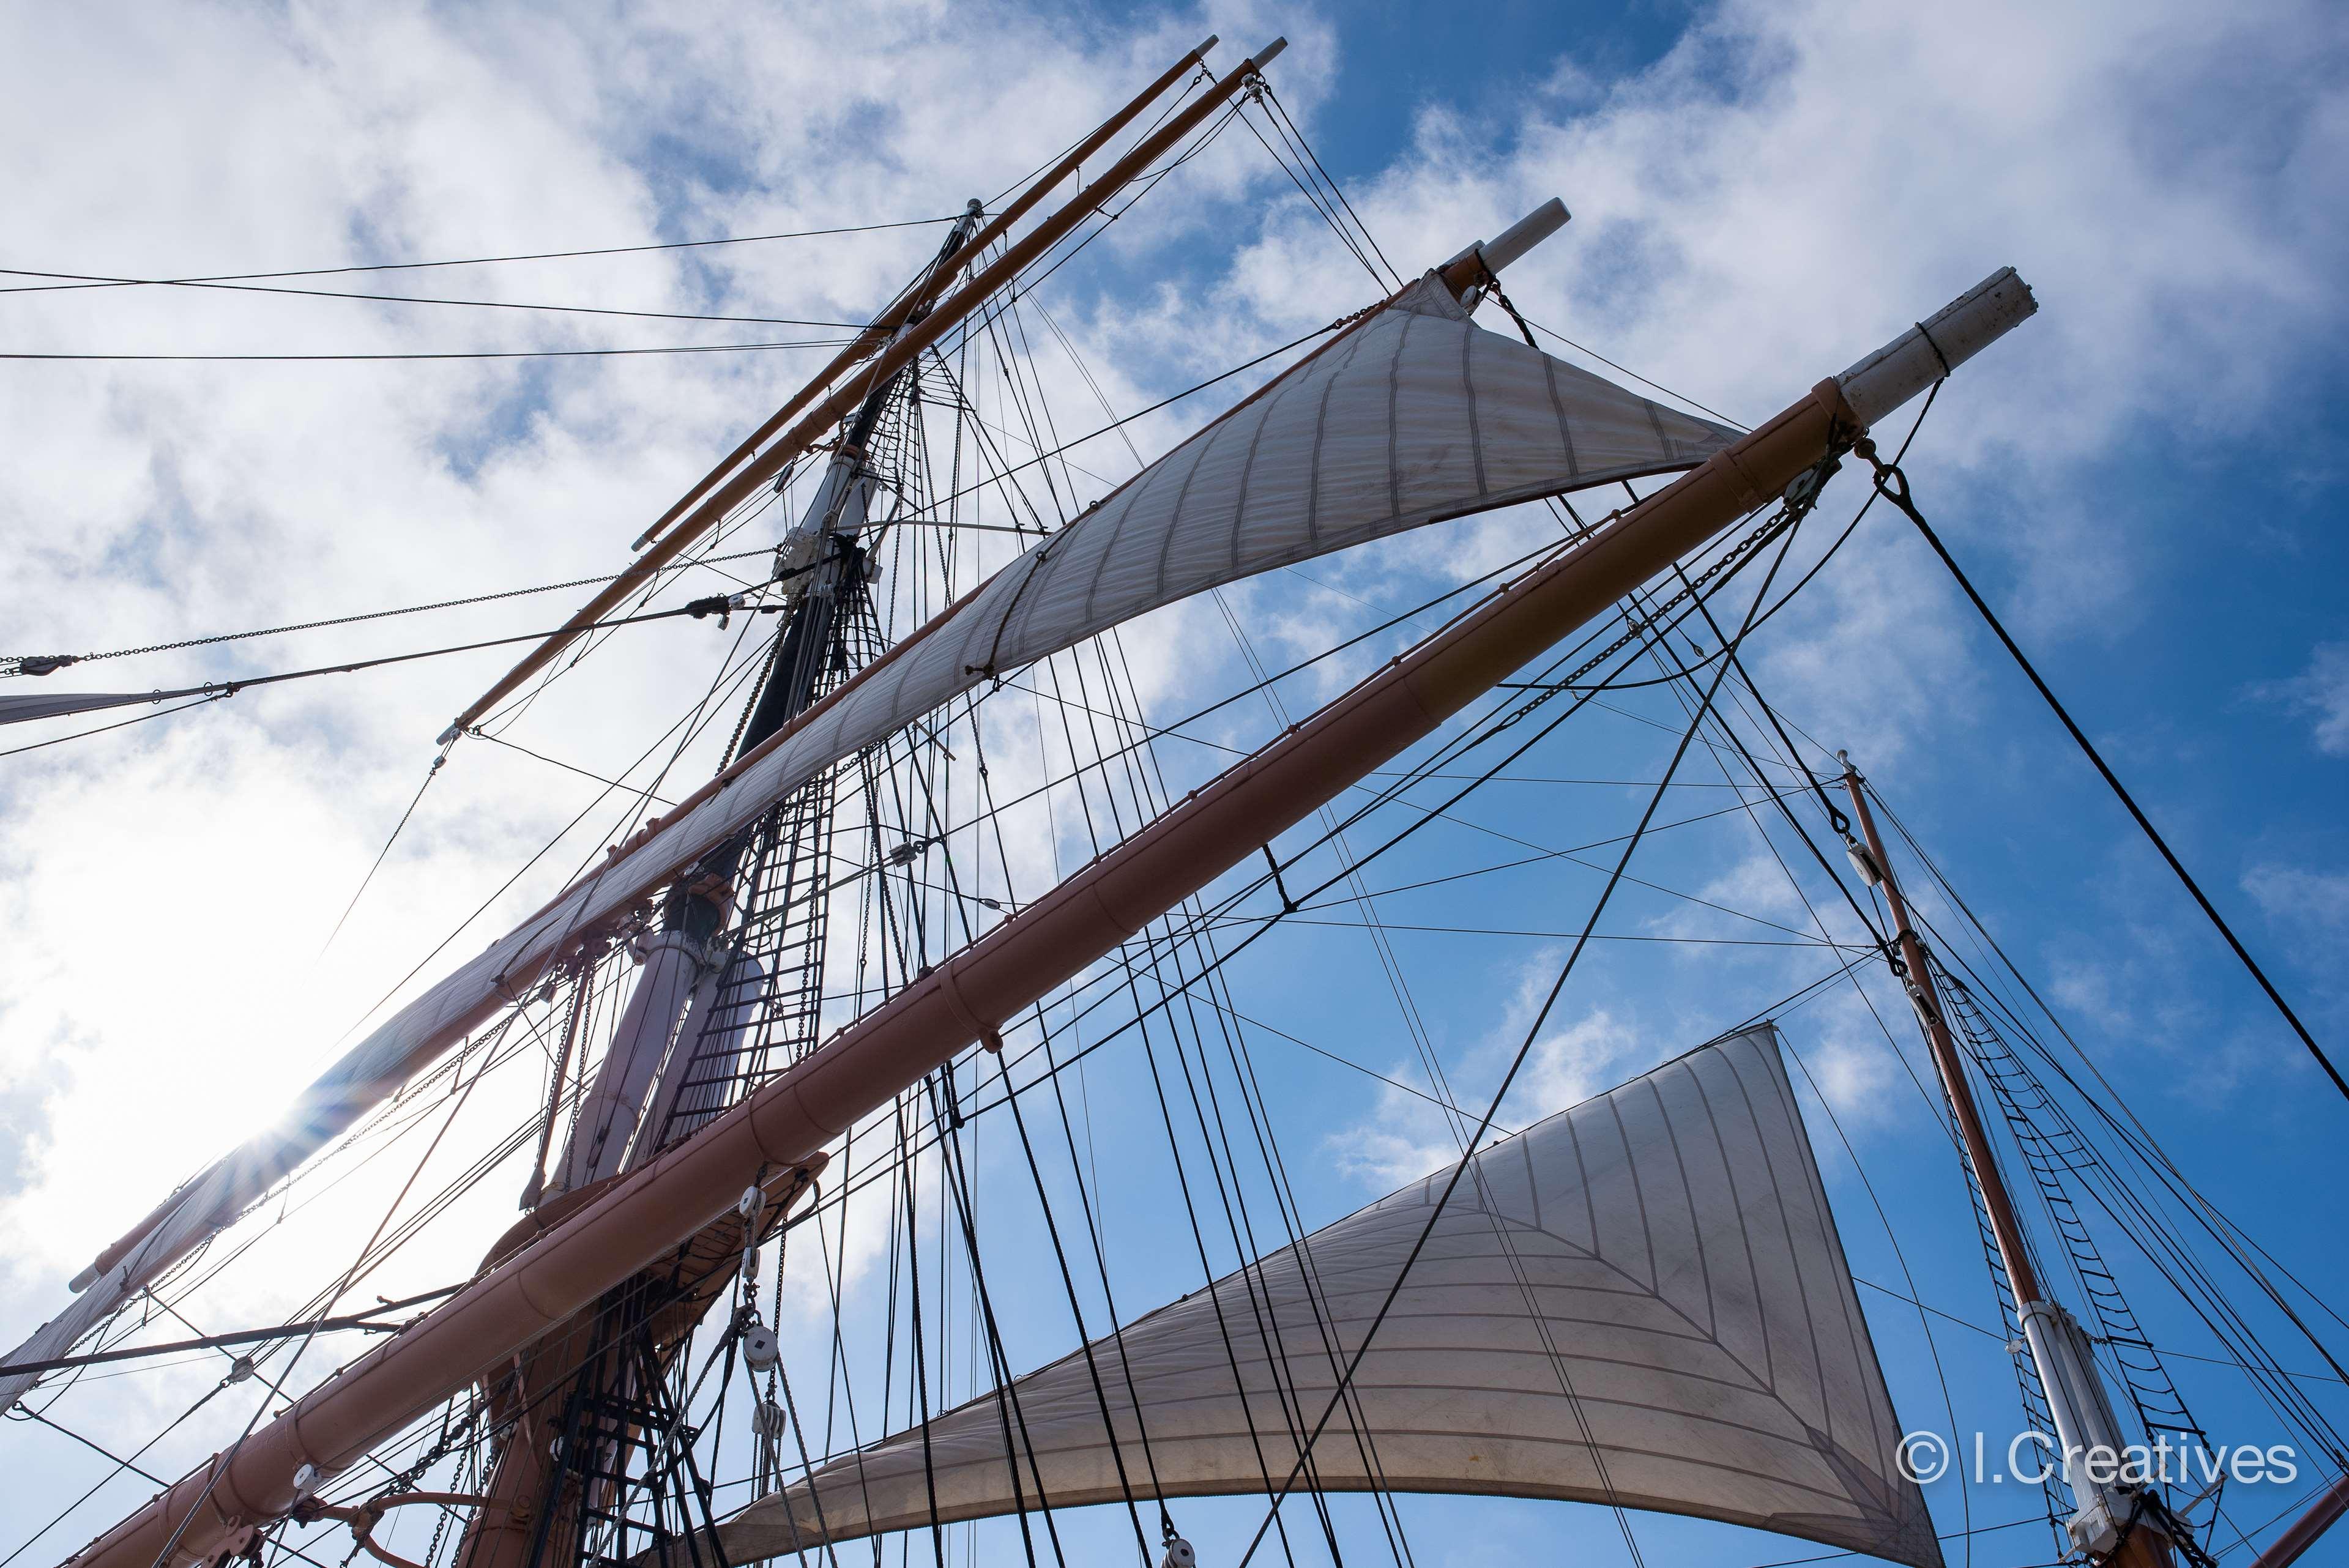 Historic Star of India Ship